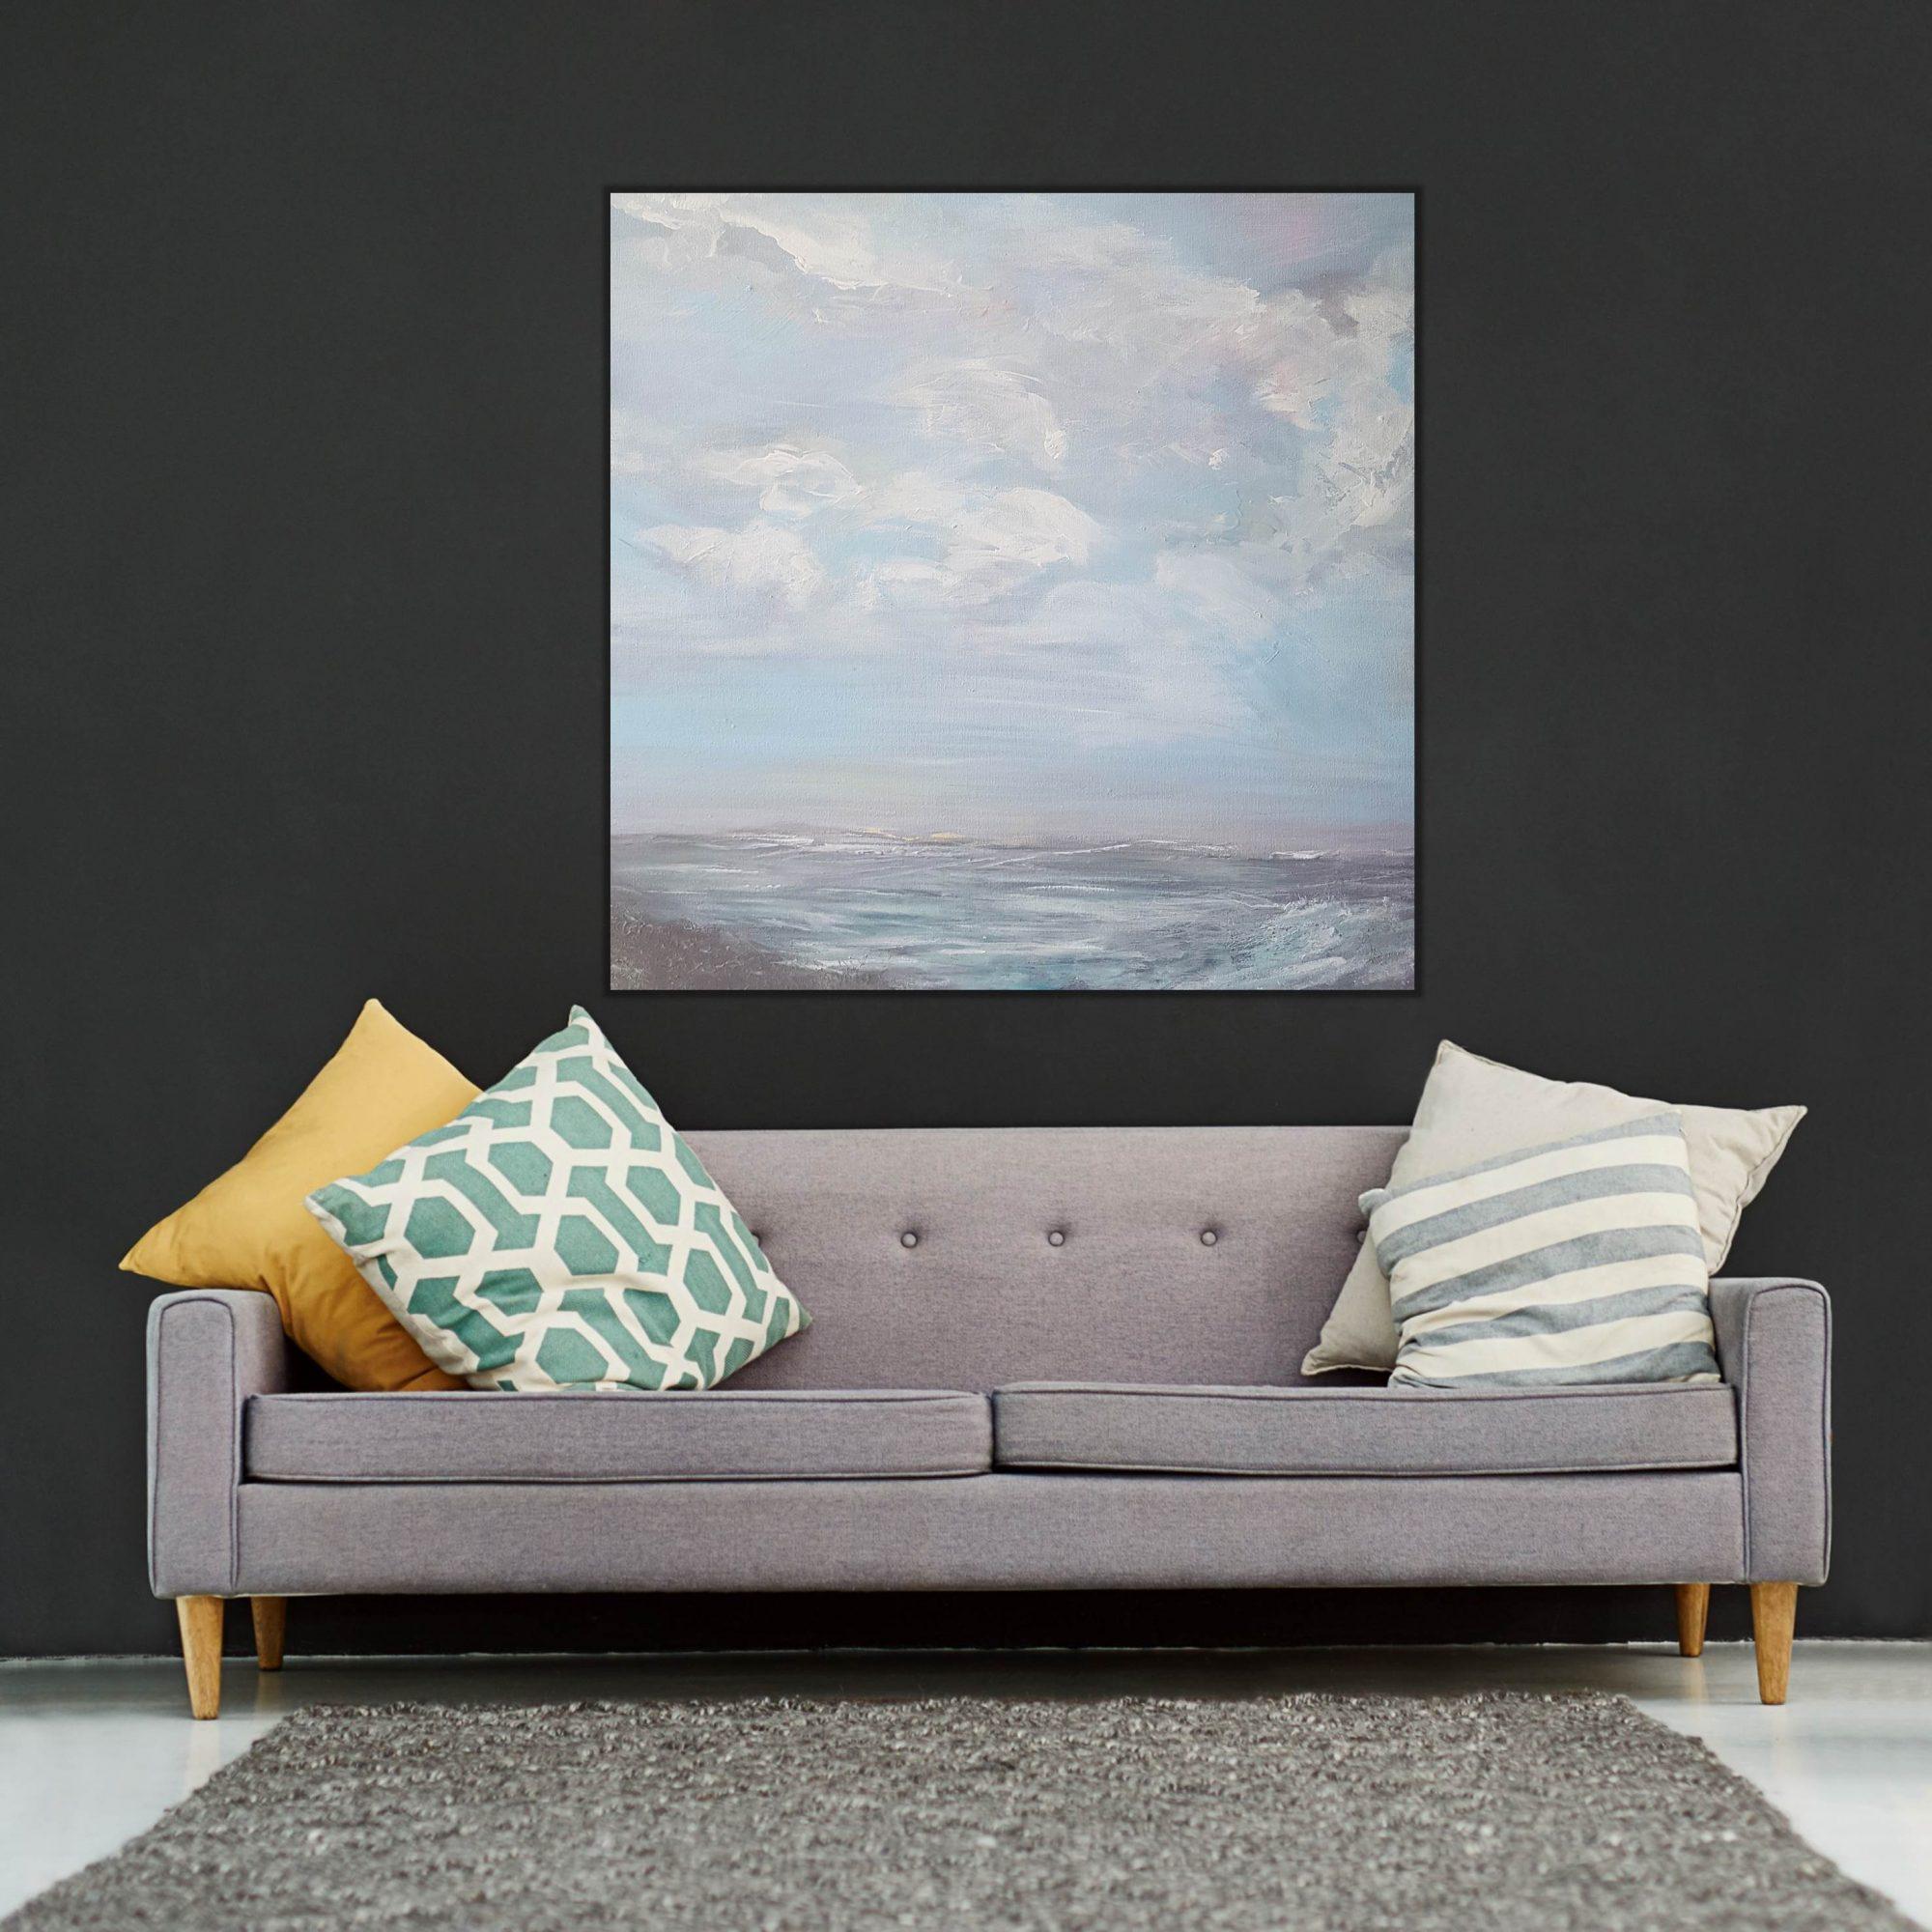 coastal-blue-with-blk-wall-grey-lounge